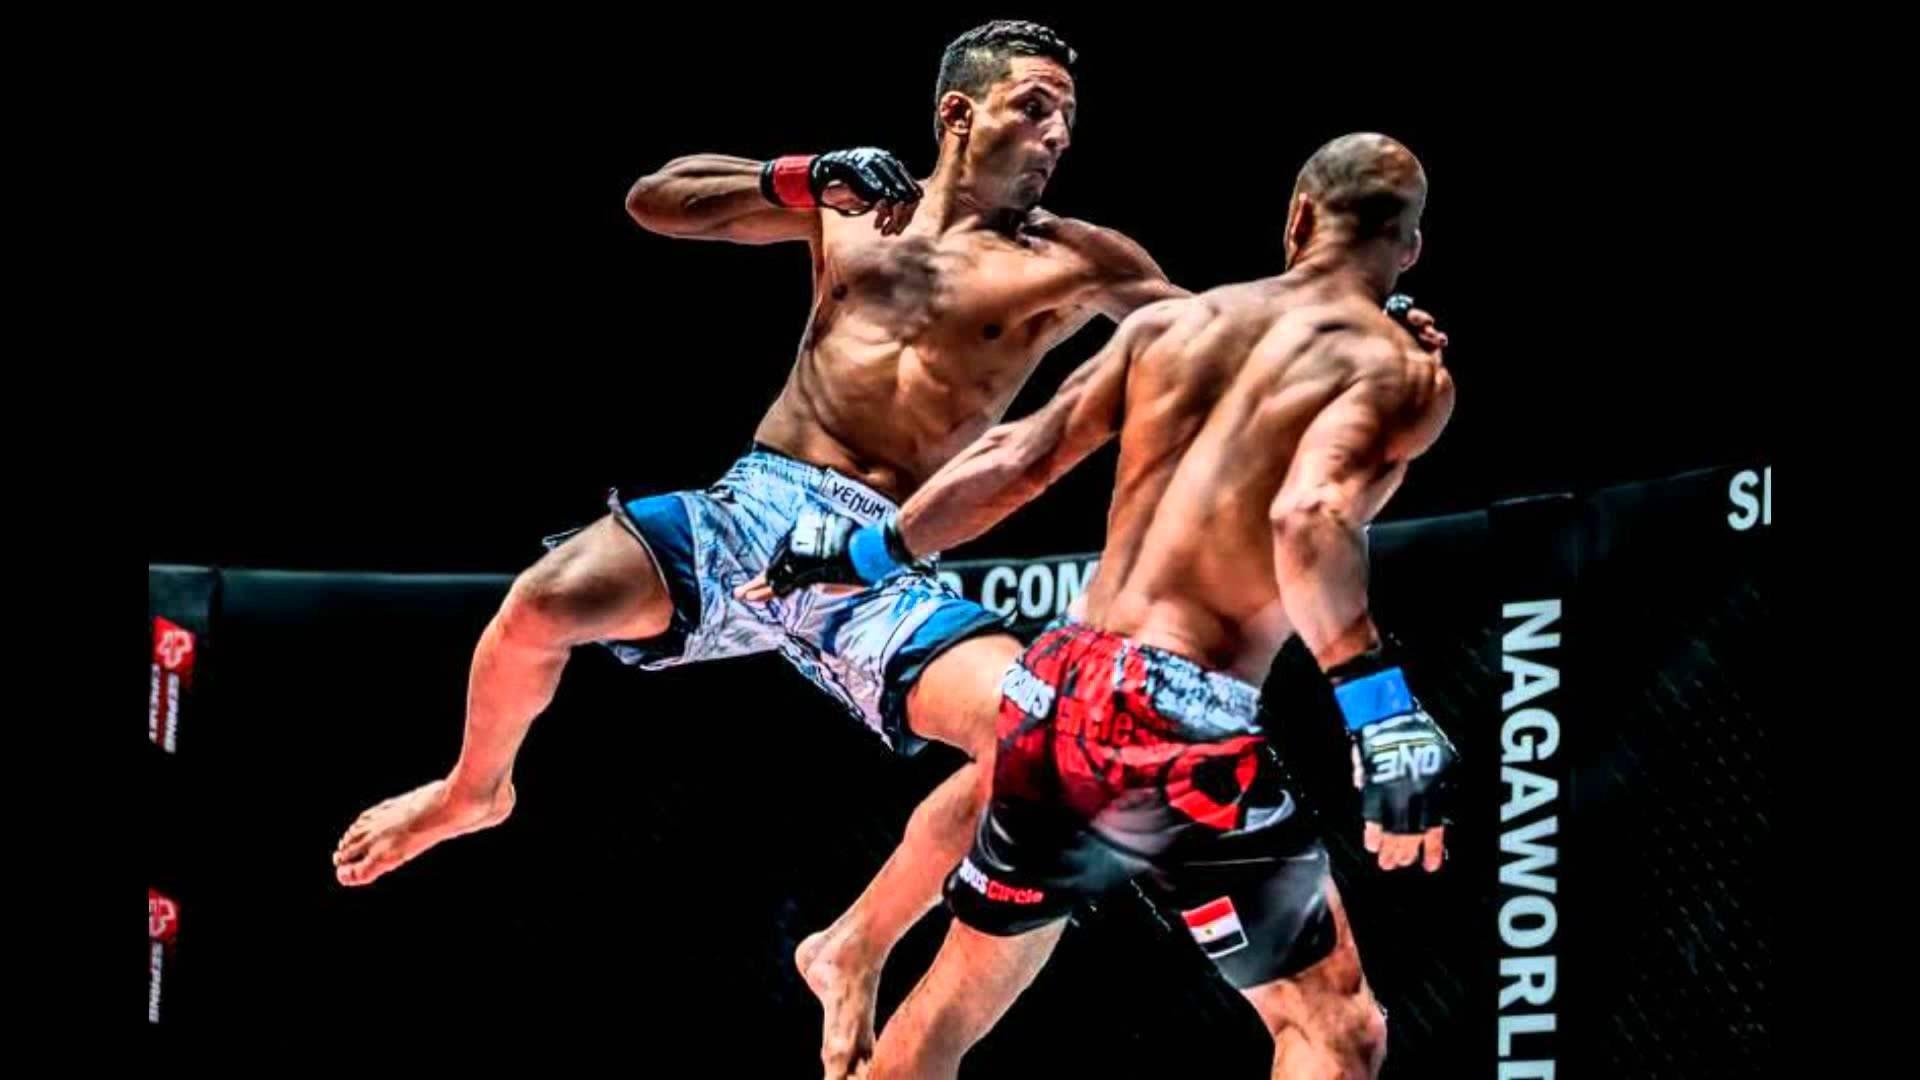 Boxing Ring Wallpaper Hd Mixed Martial Arts Wallpaper 65 Images